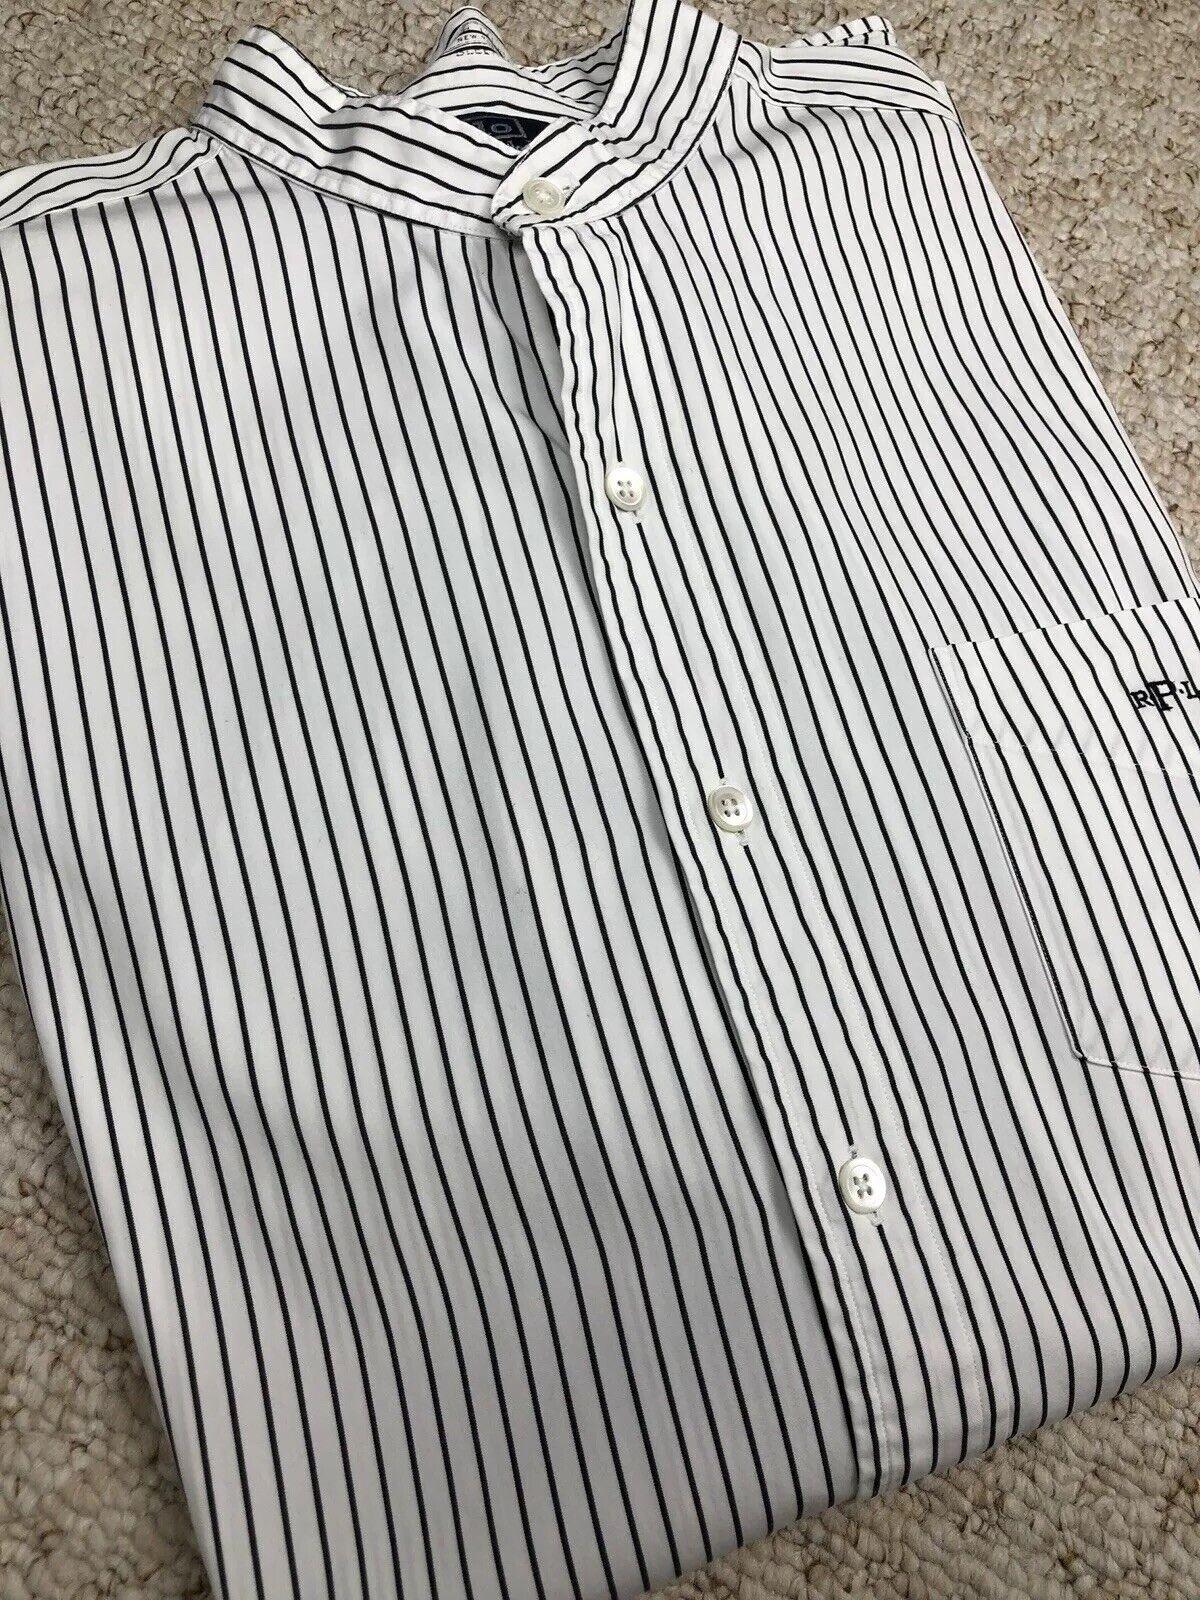 Ralph Lauren White bluee Shirt Polo Striped Original Cotton Grandad Collar Large